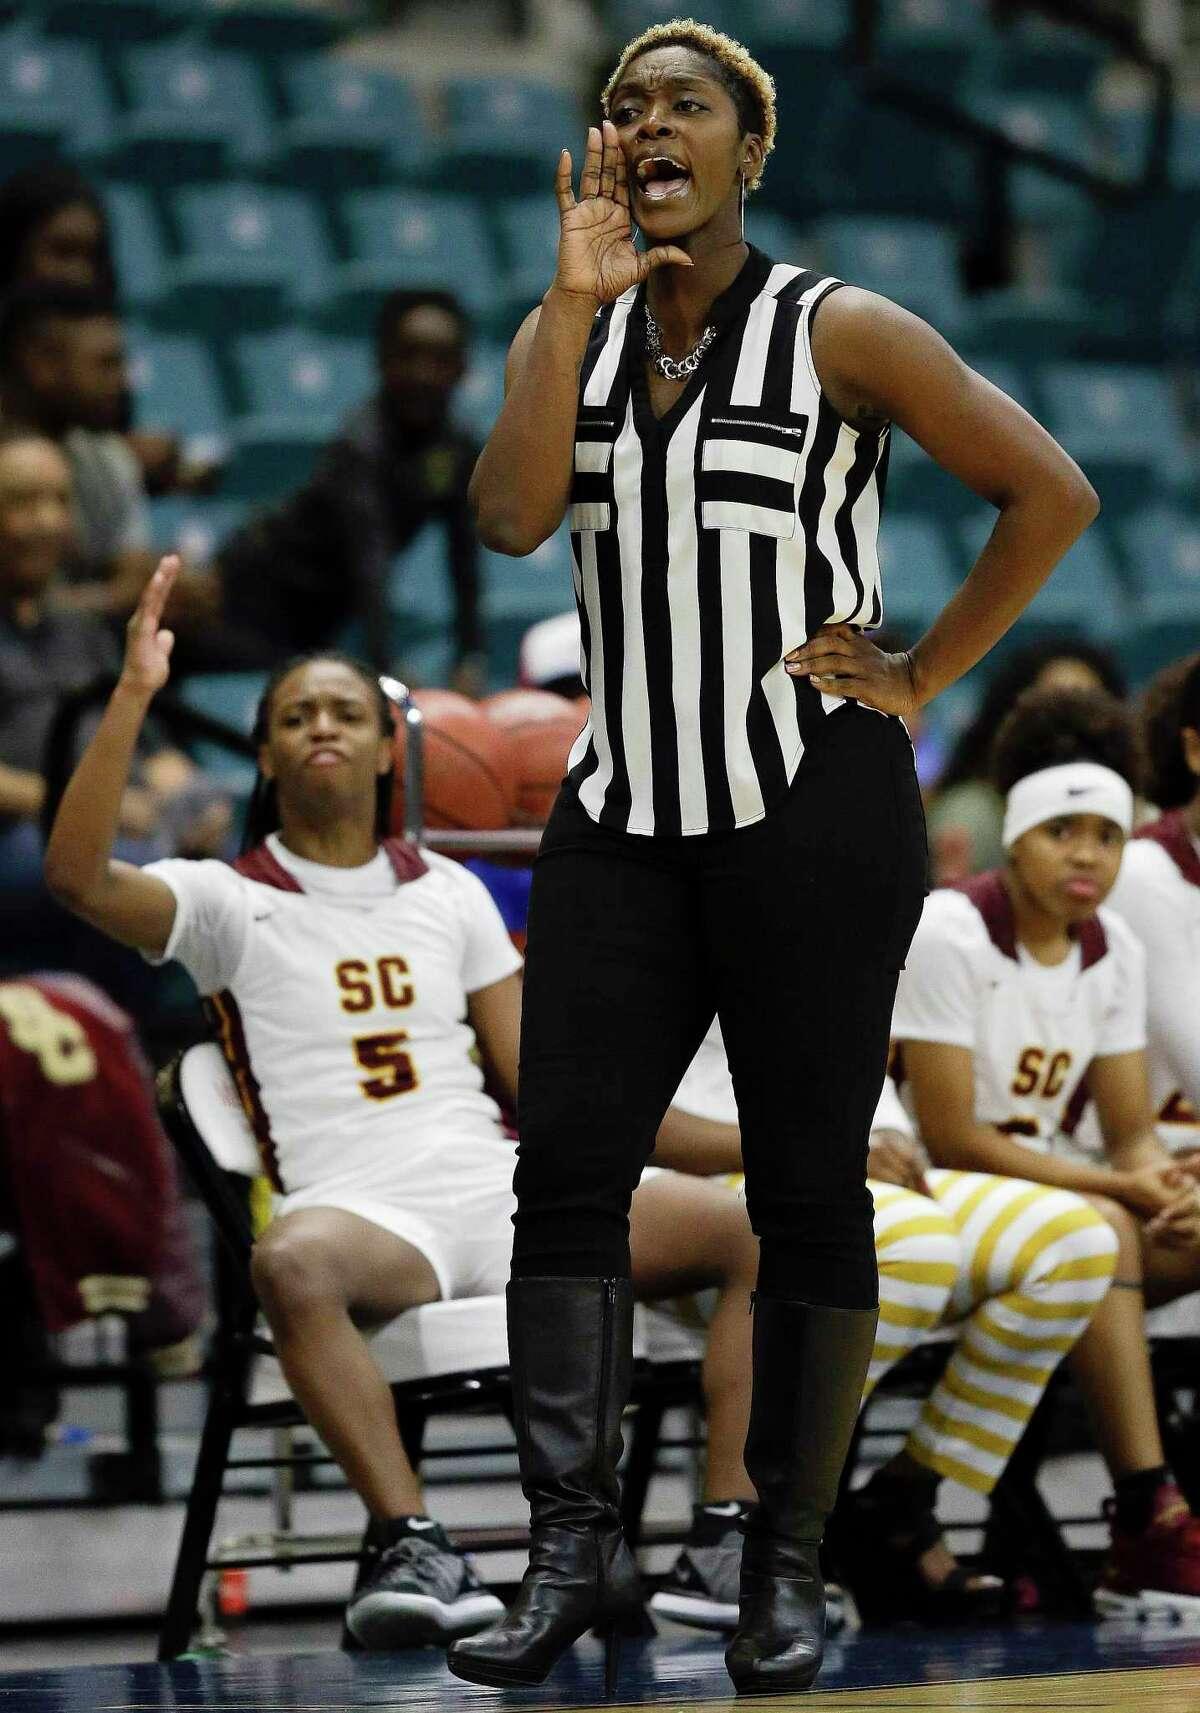 Summer Creek head coach Carlesa Dixon yells instructions during the first half of a 6A regional championship basketball game against Westside, Saturday, Feb. 23, 2019, in Katy, TX.